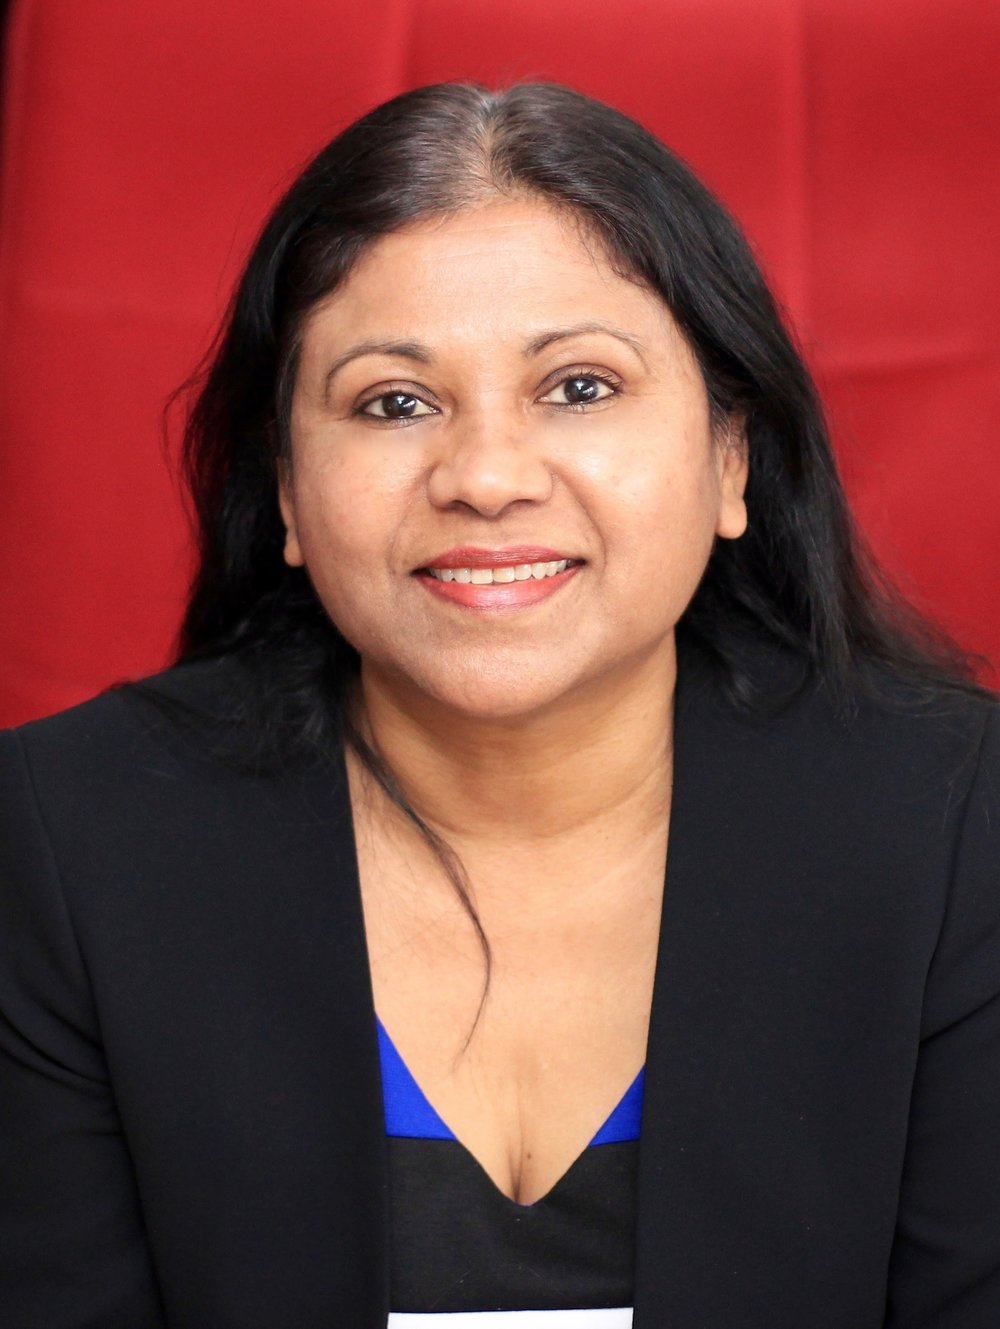 Shireen Ali